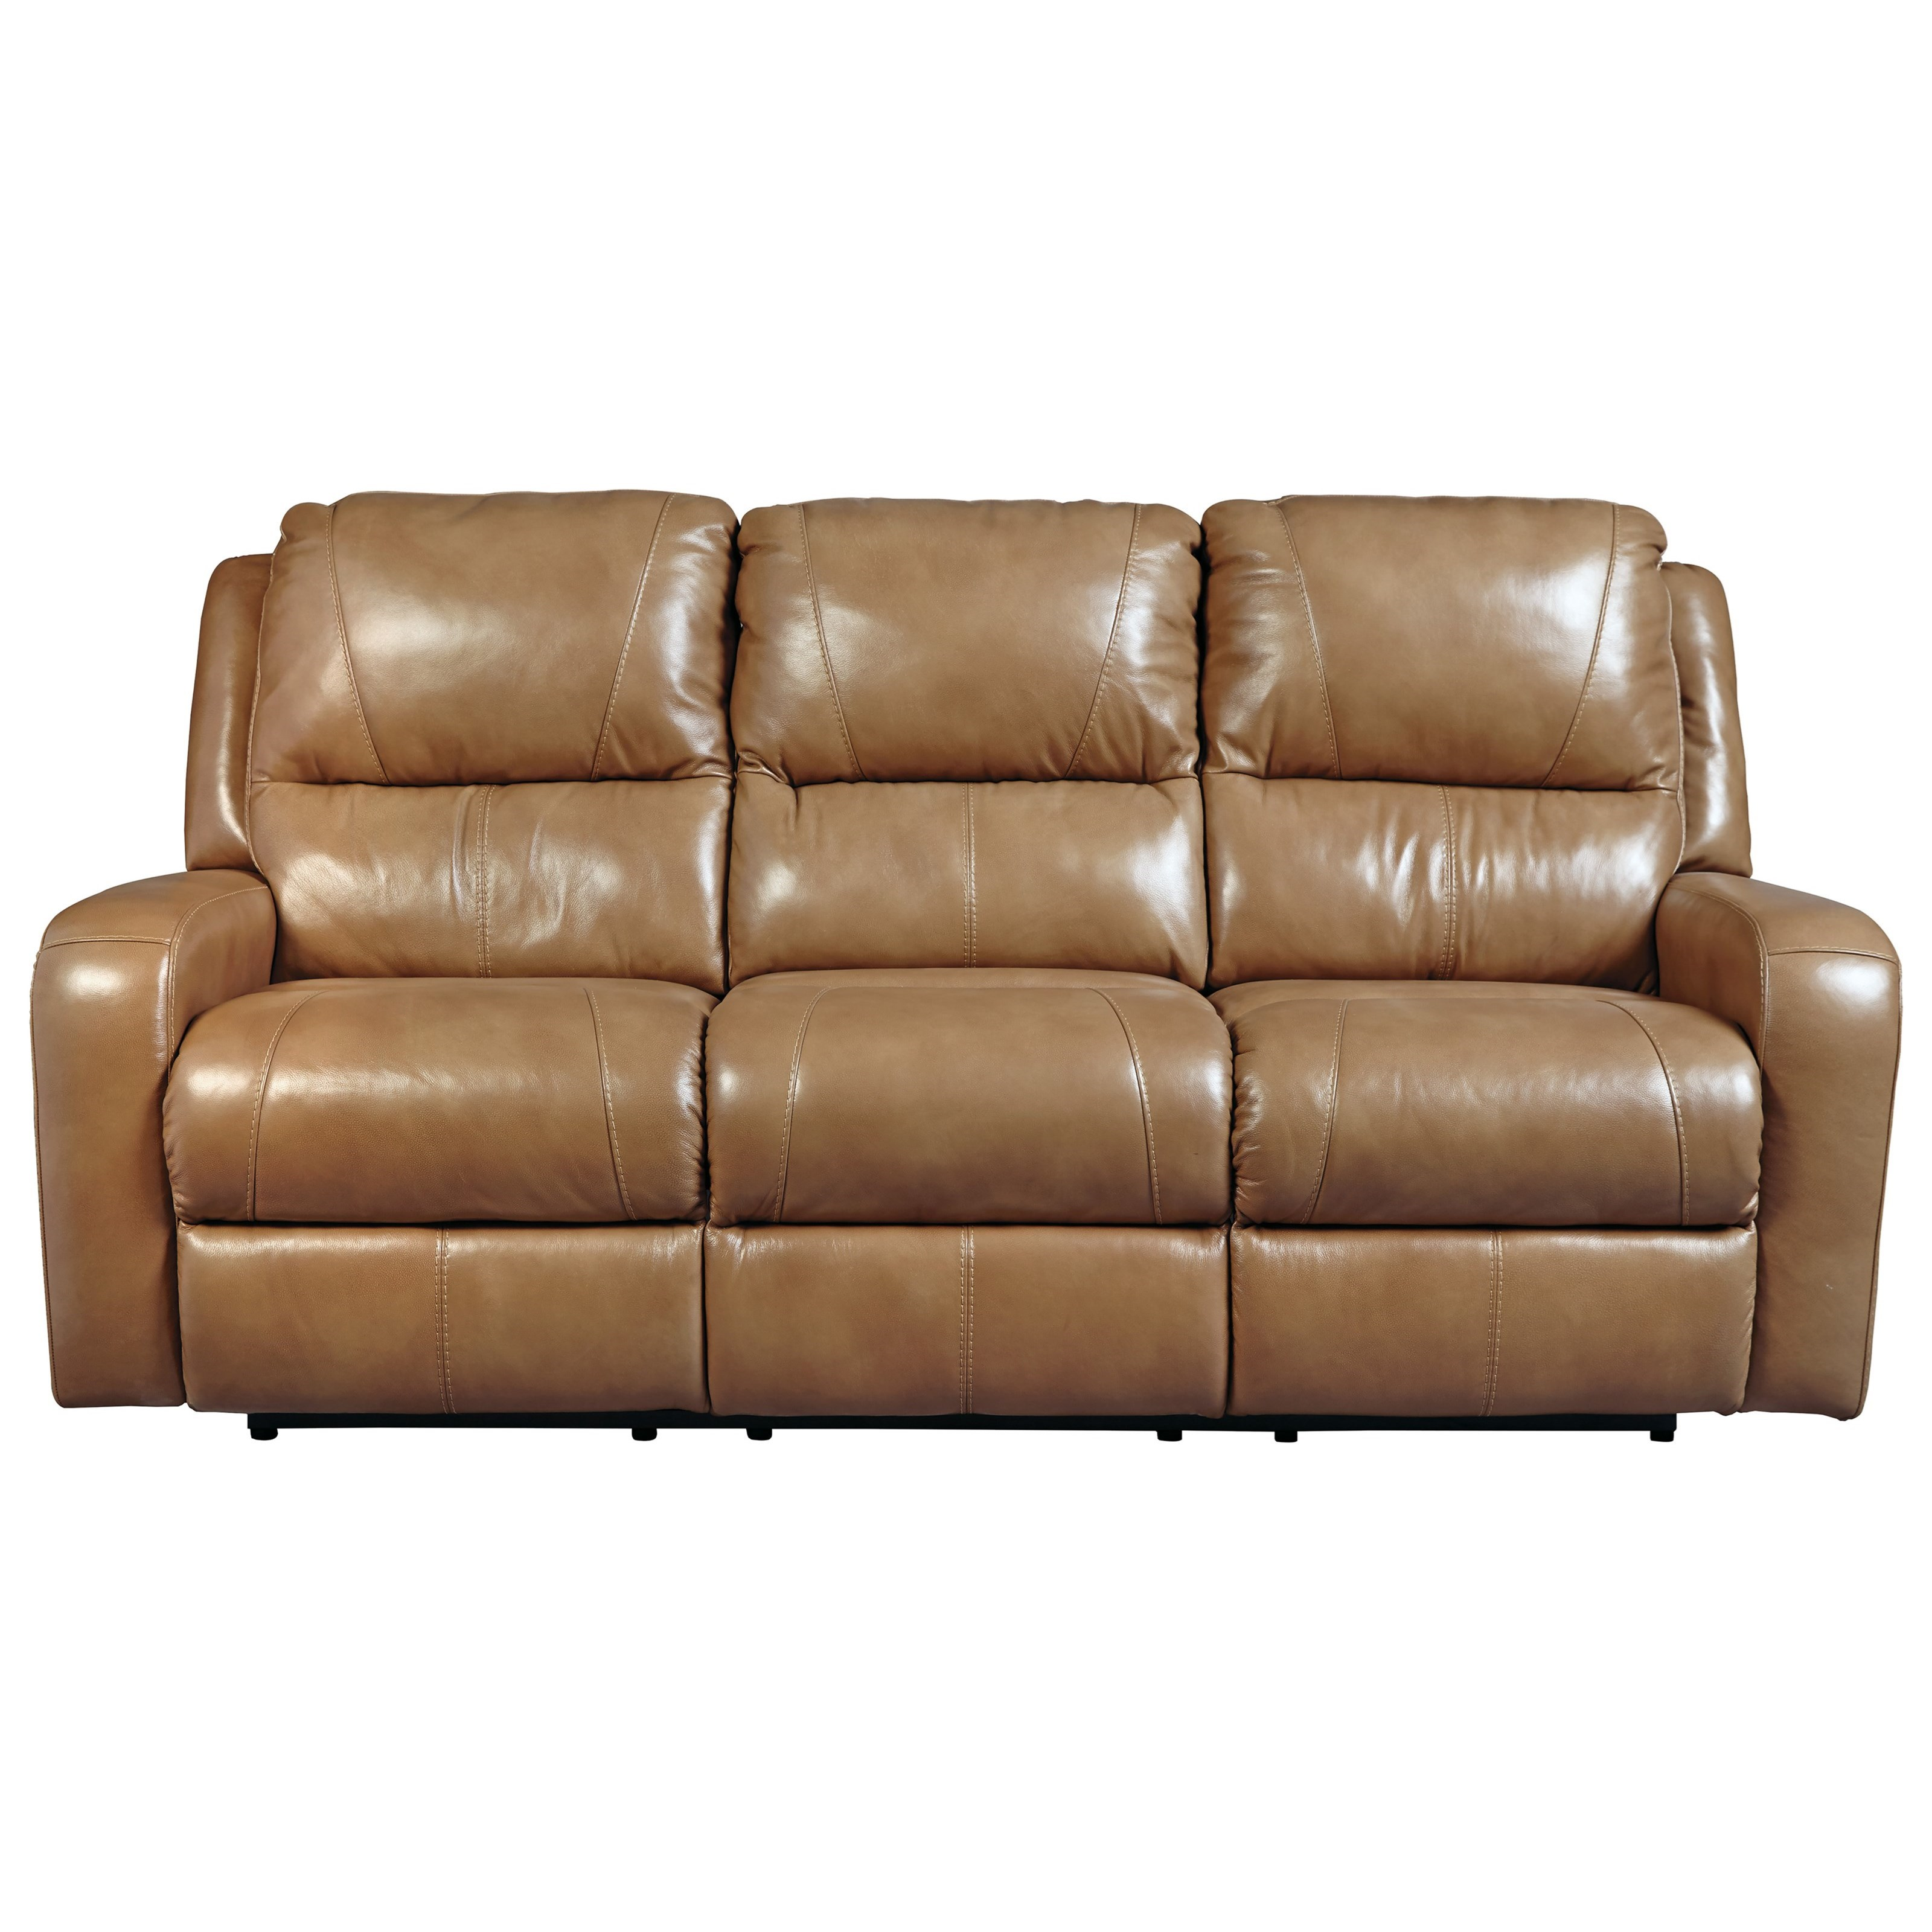 Signature design by ashley roogan contemporary reclining for Contemporary reclining sofas